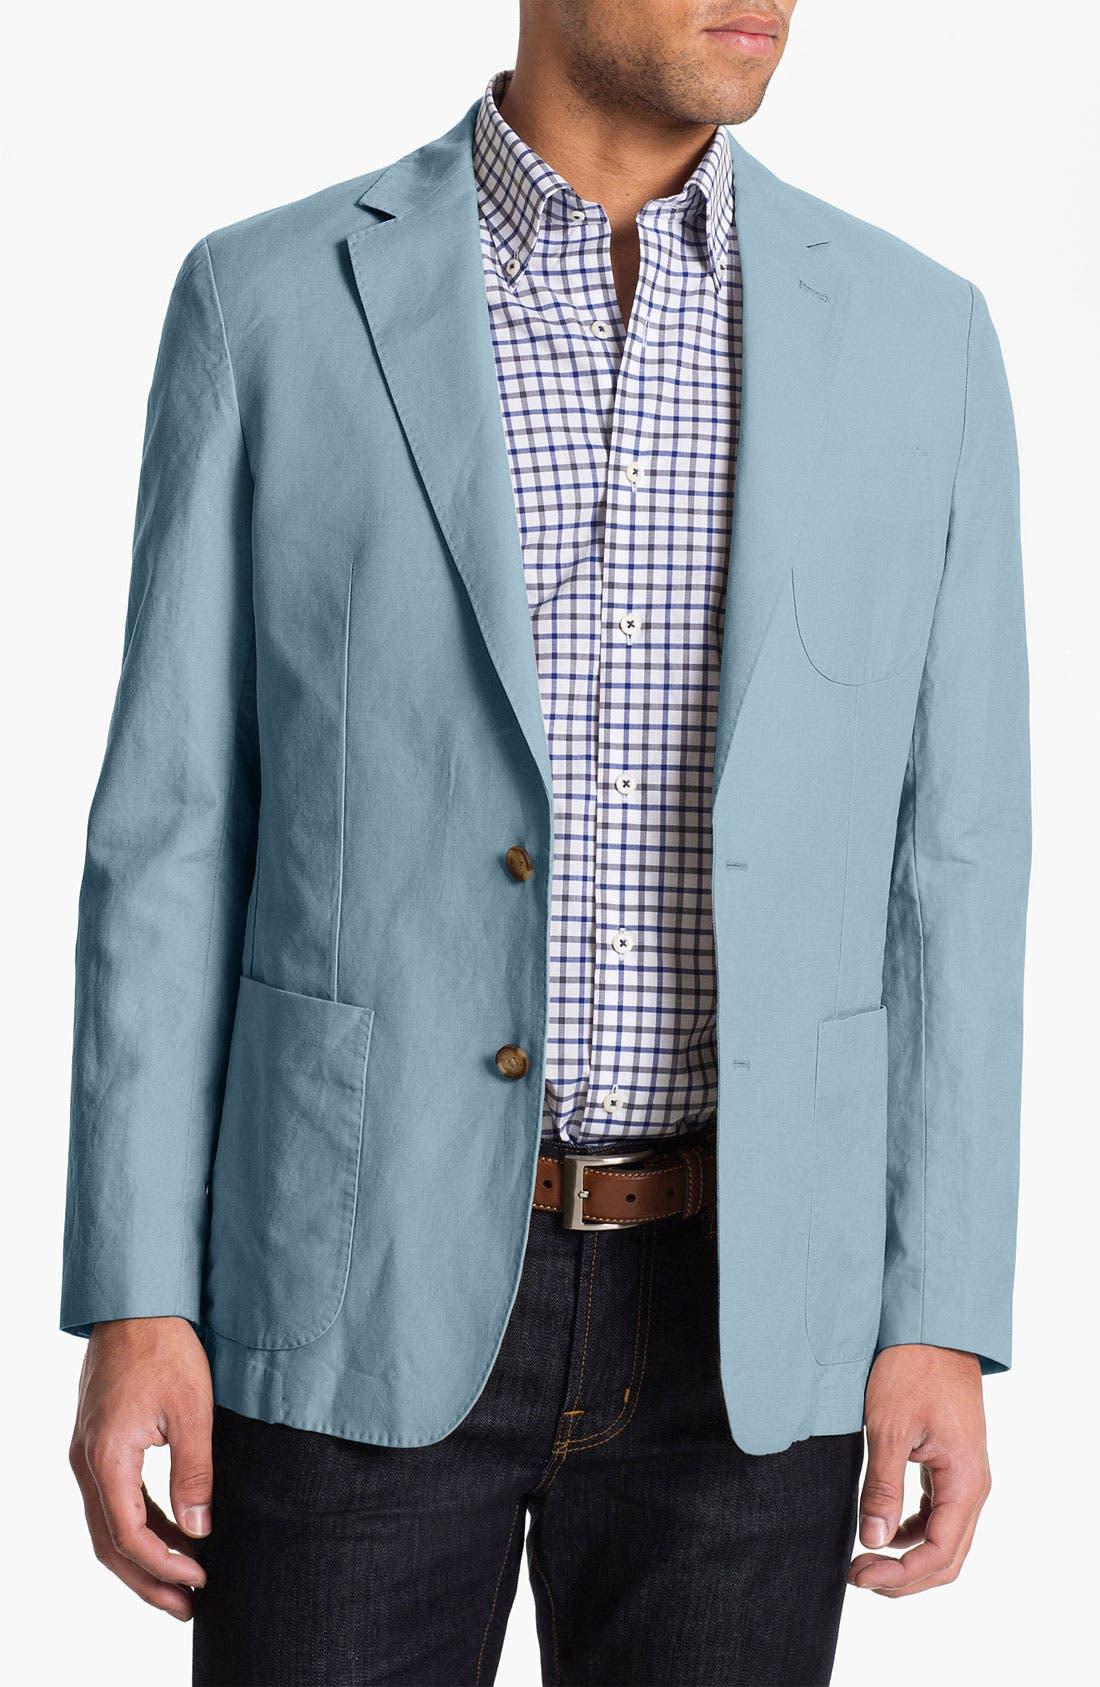 Alternate Image 1 Selected - Peter Millar Linen Blend Sportcoat